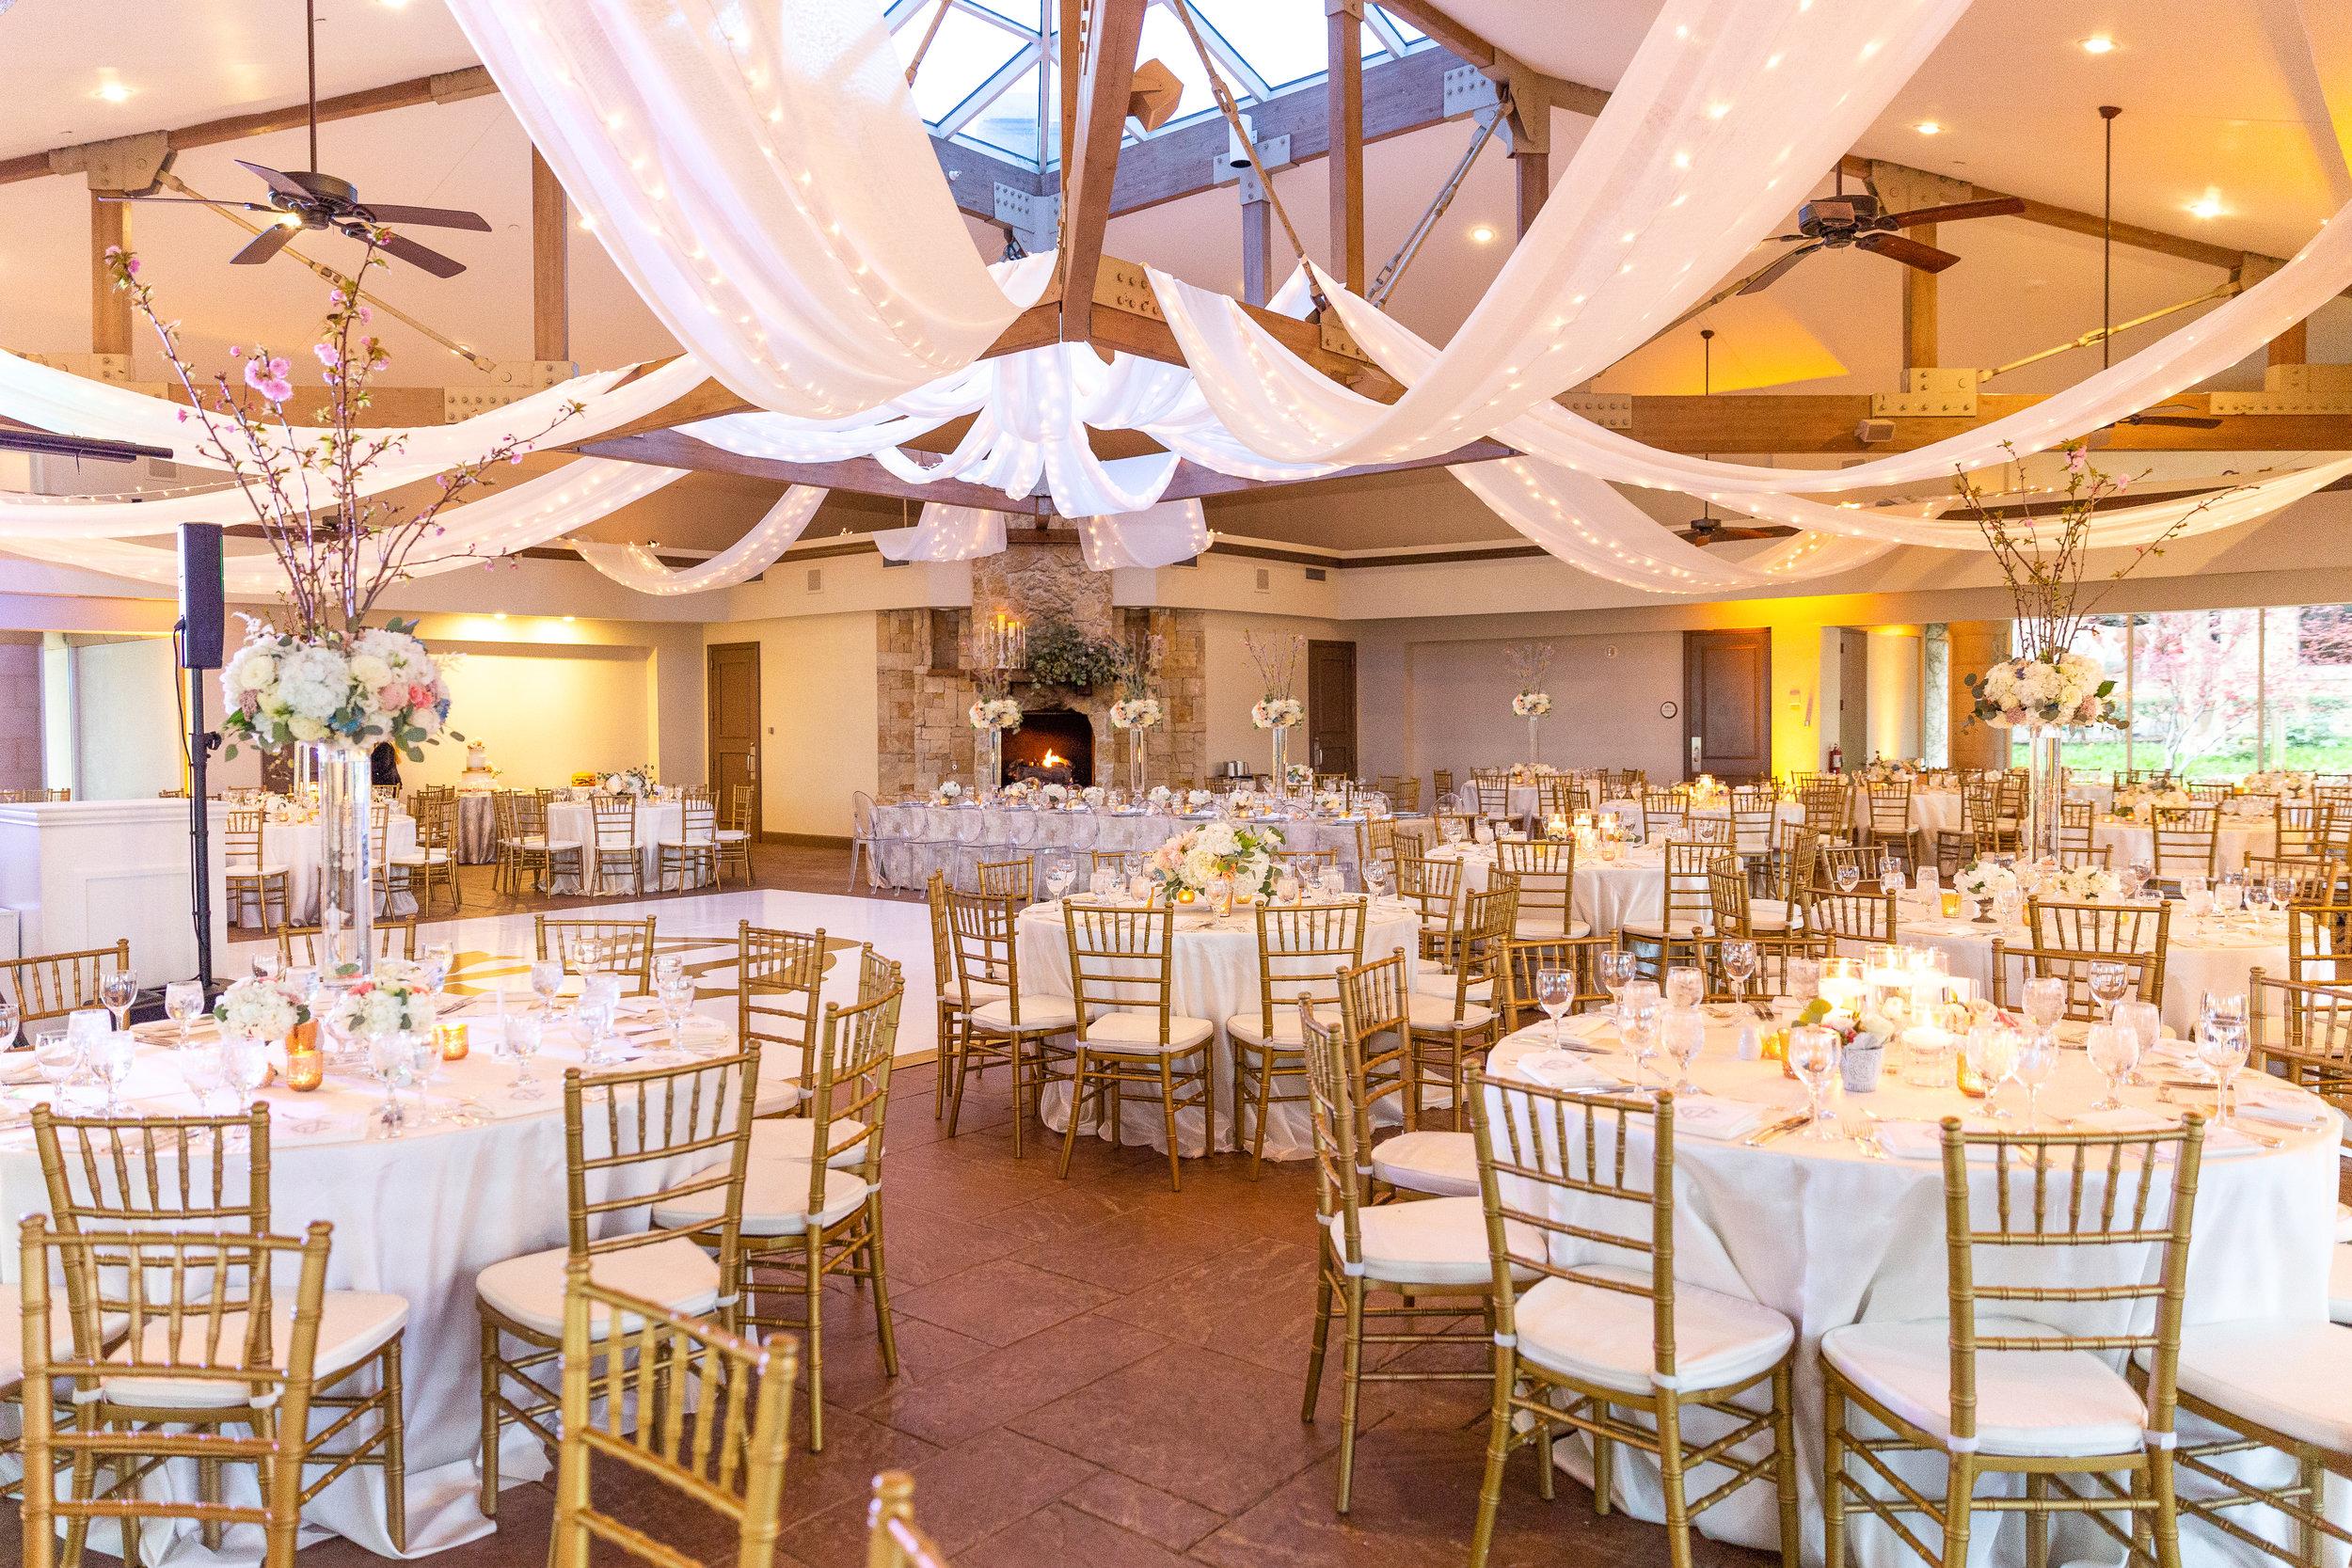 DFW Wedding Planner - Caroline + Jeff at The Four Seasons Hotel Wedding - Allday Events - 218.jpg